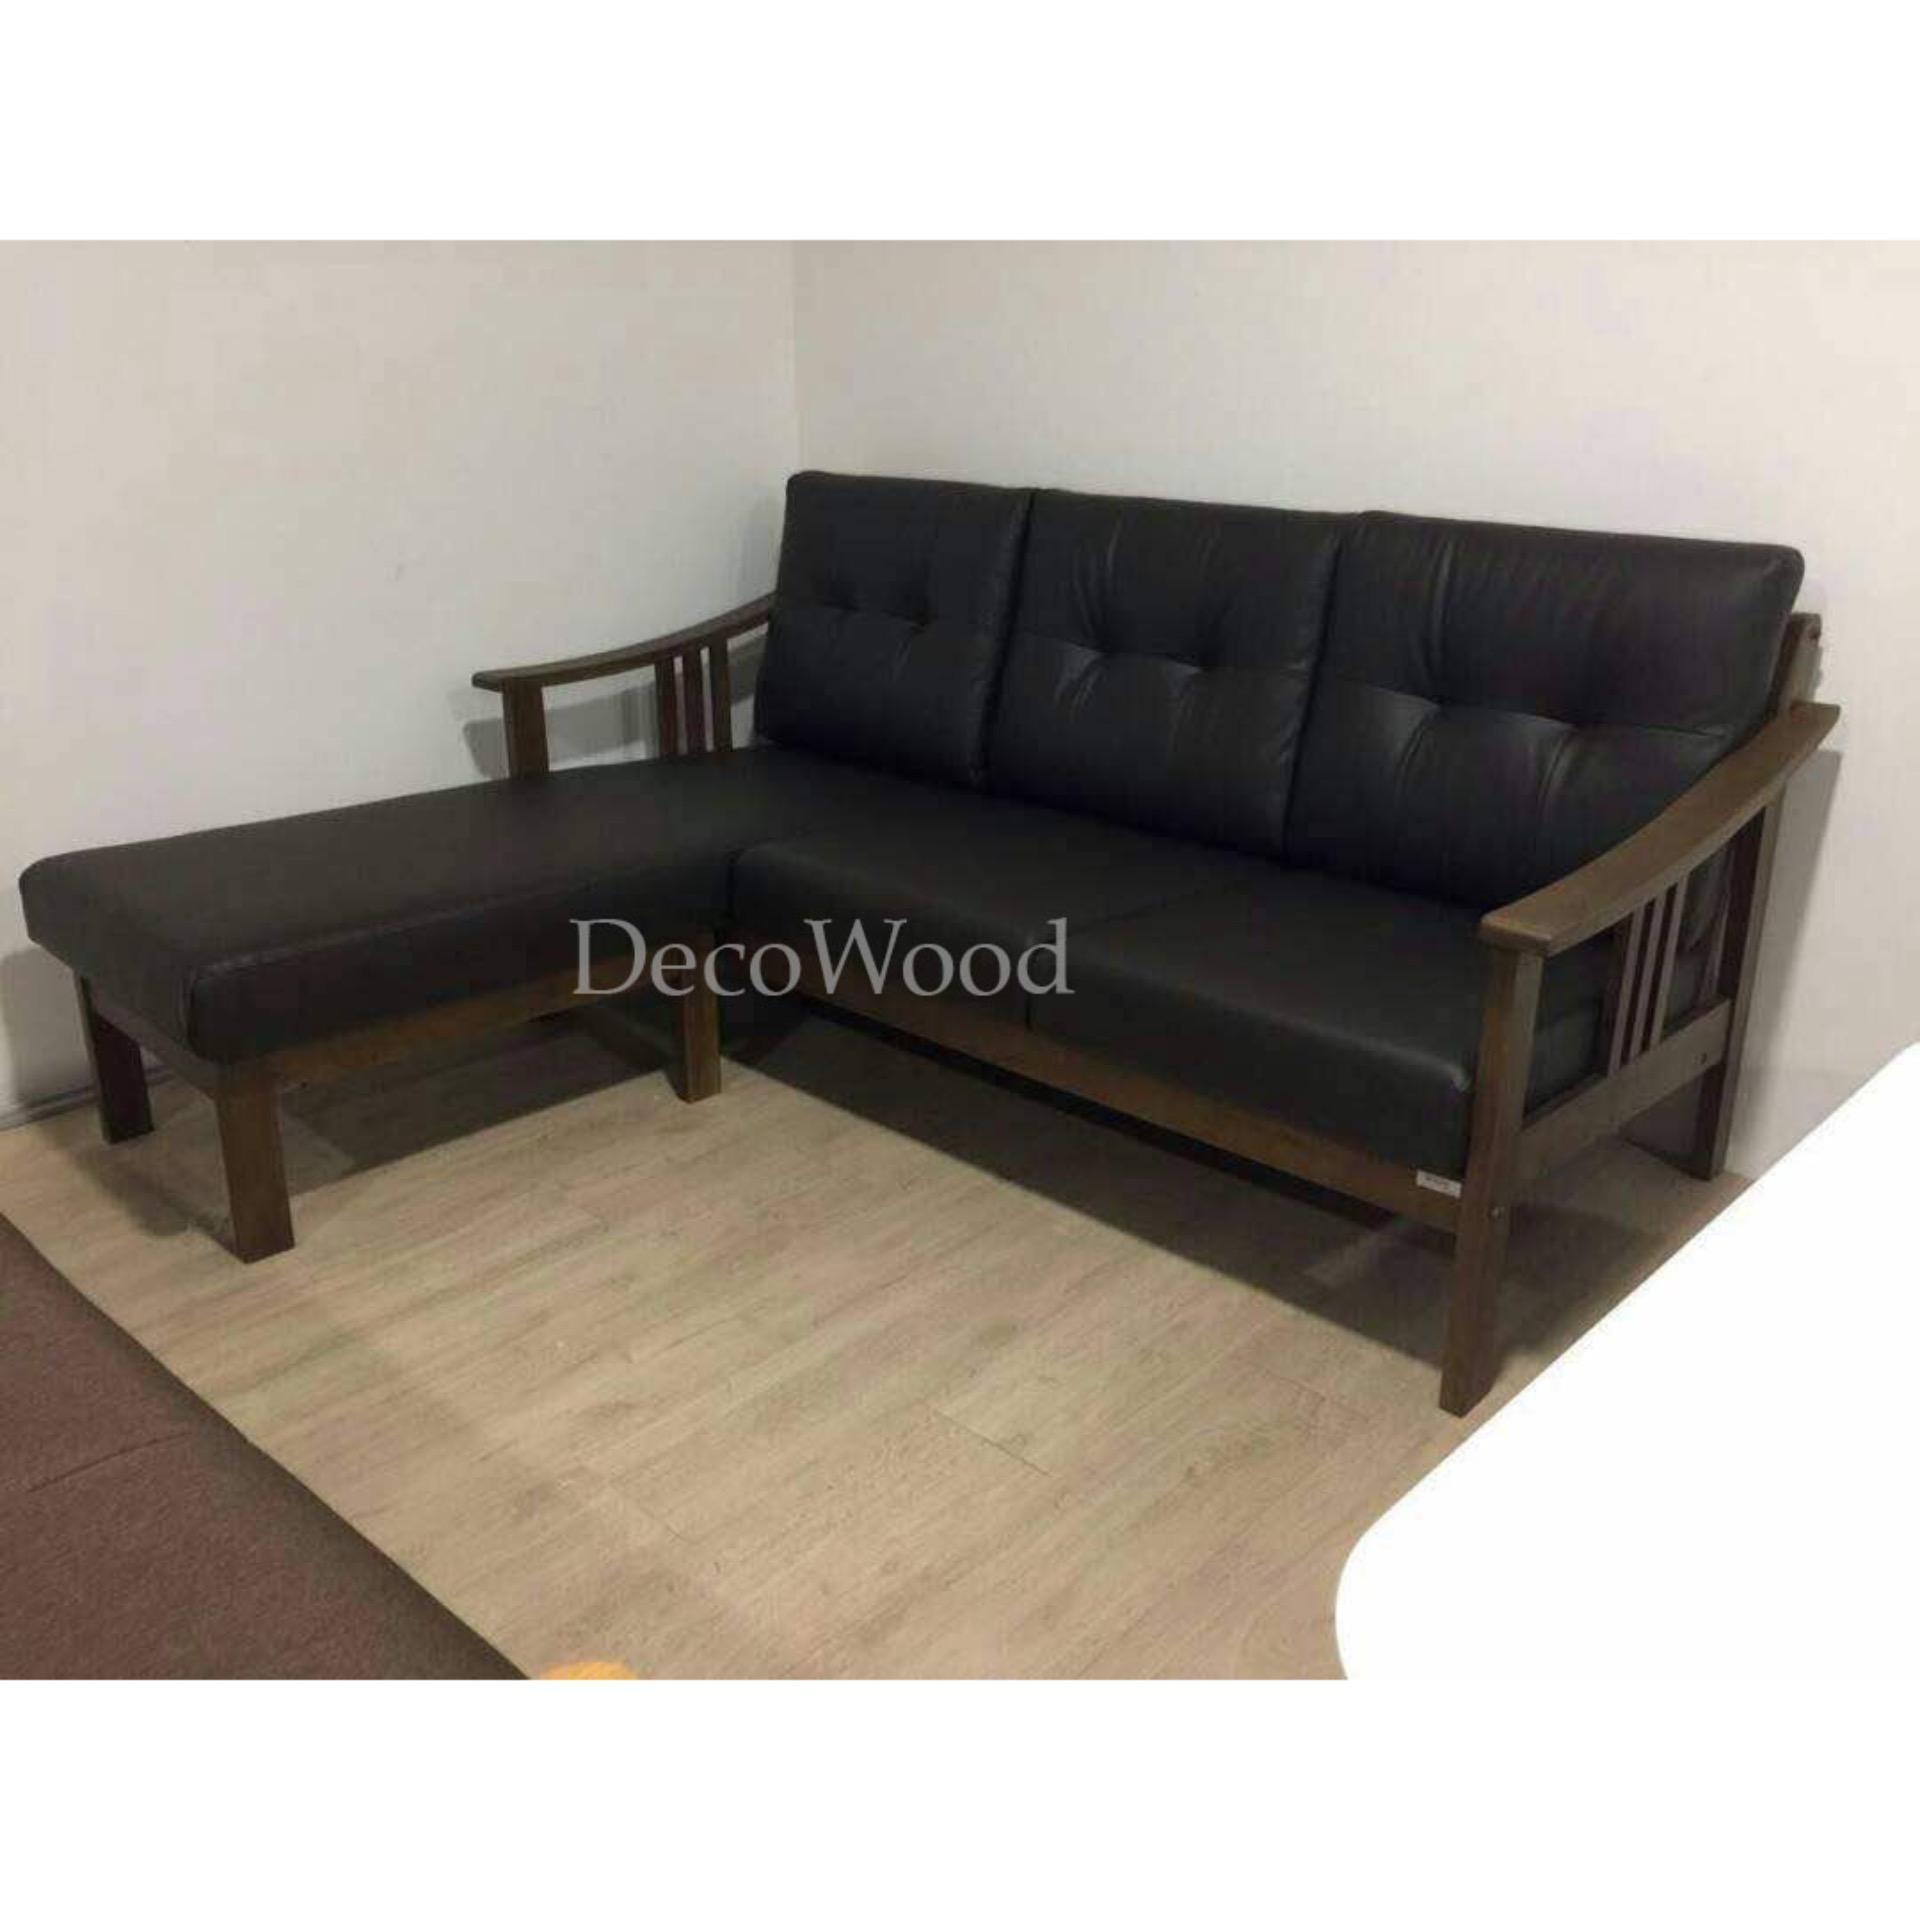 Solid Wood L Shape Cushion Sofa Loun End 5 3 2021 12 00 Am